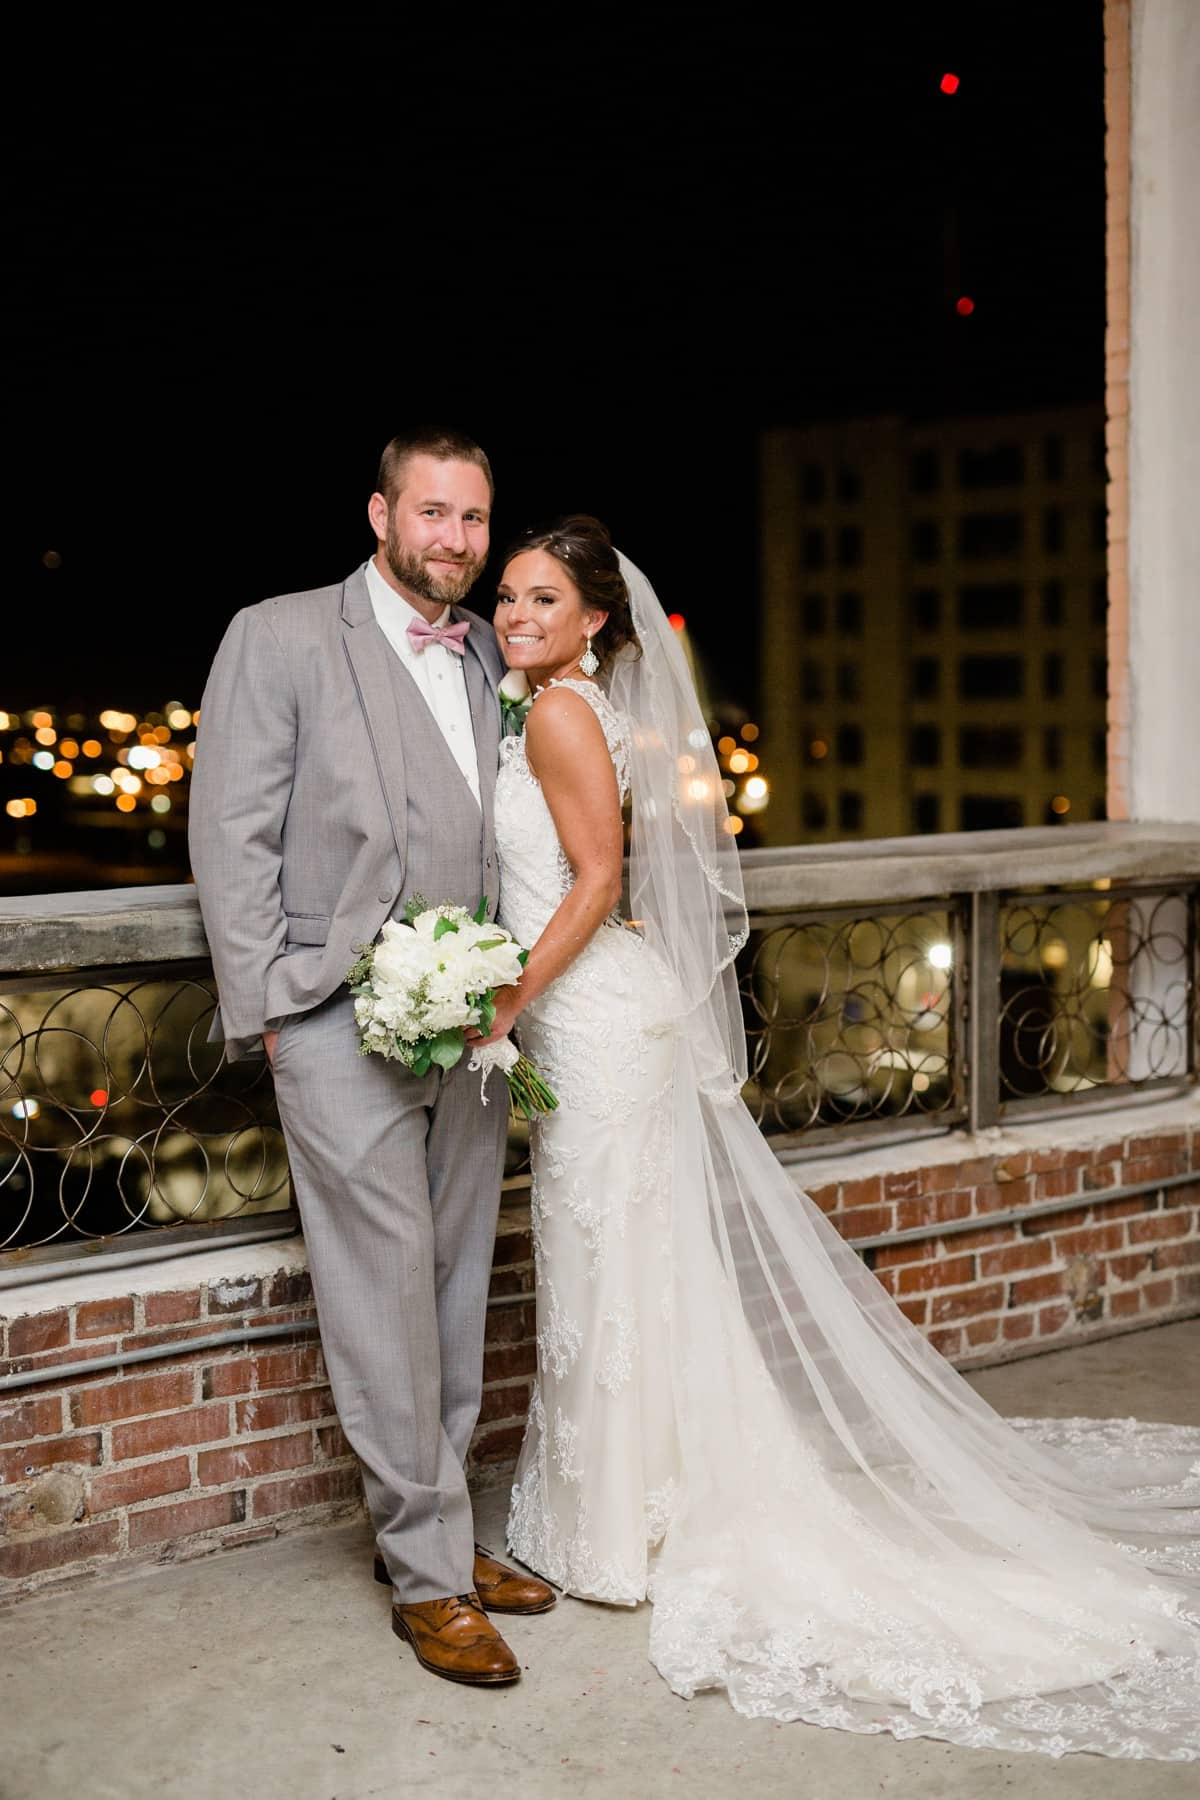 Windows on Washington Wedding, St. Louis Wedding Photographer